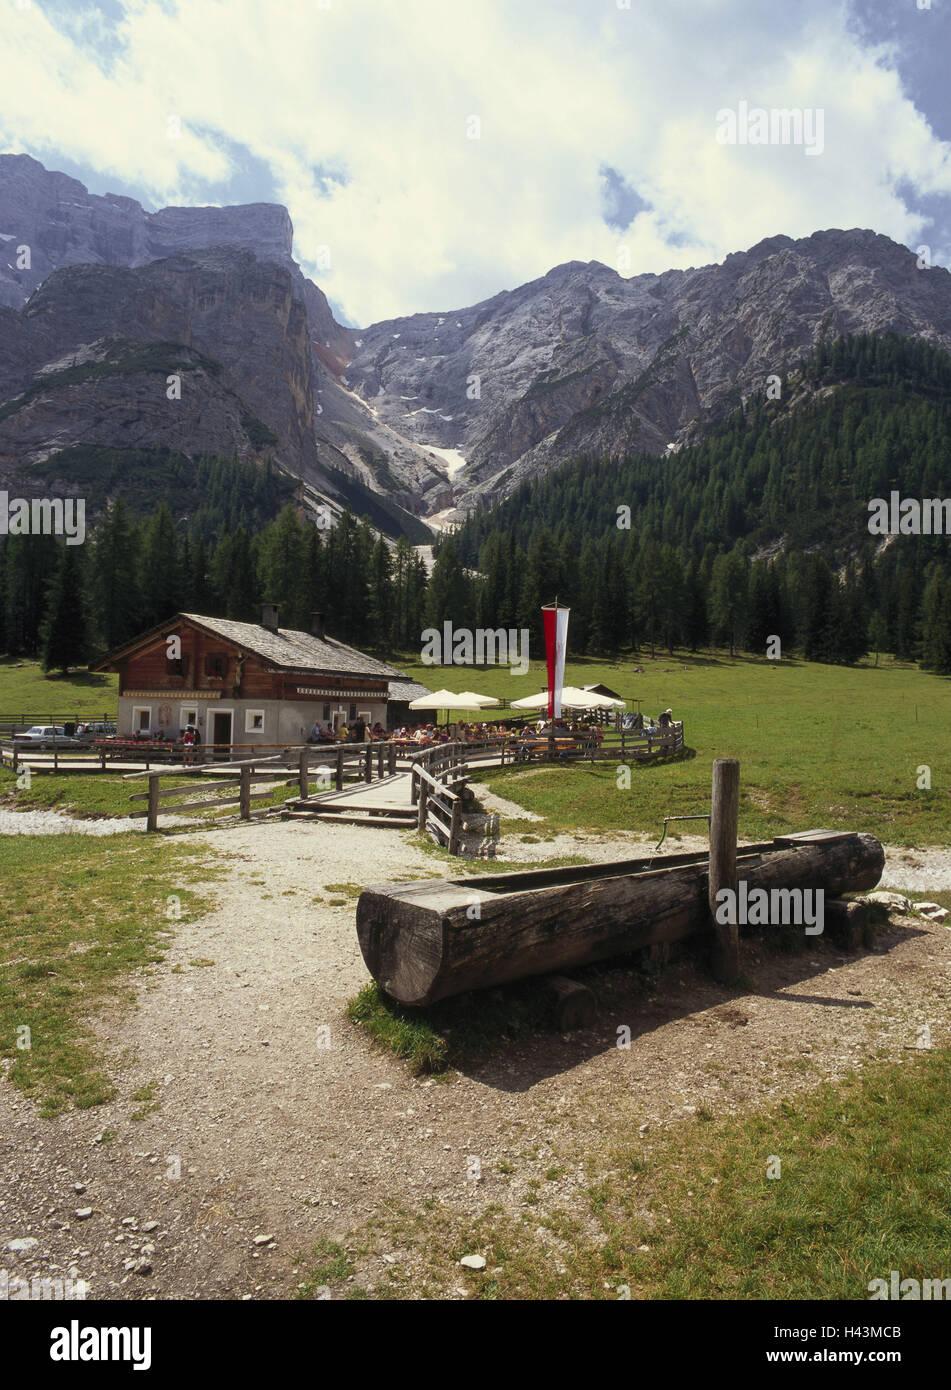 Italia El Tirol Del Sur Dolomitas Madera Verde Alp